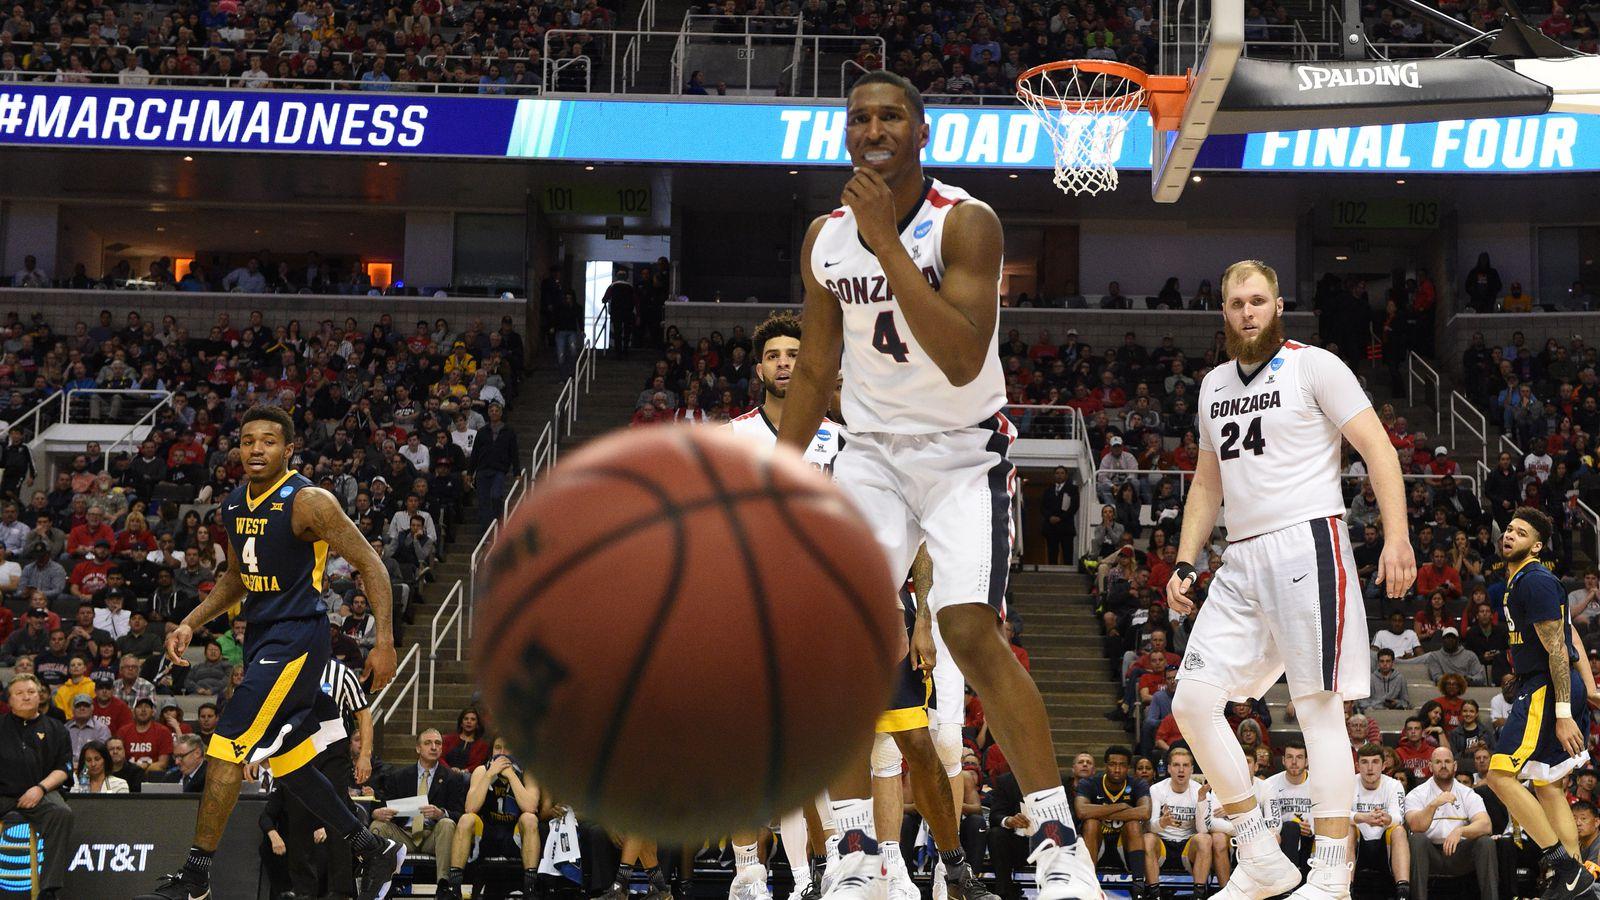 usa today ncaa basketball odds twins game live online